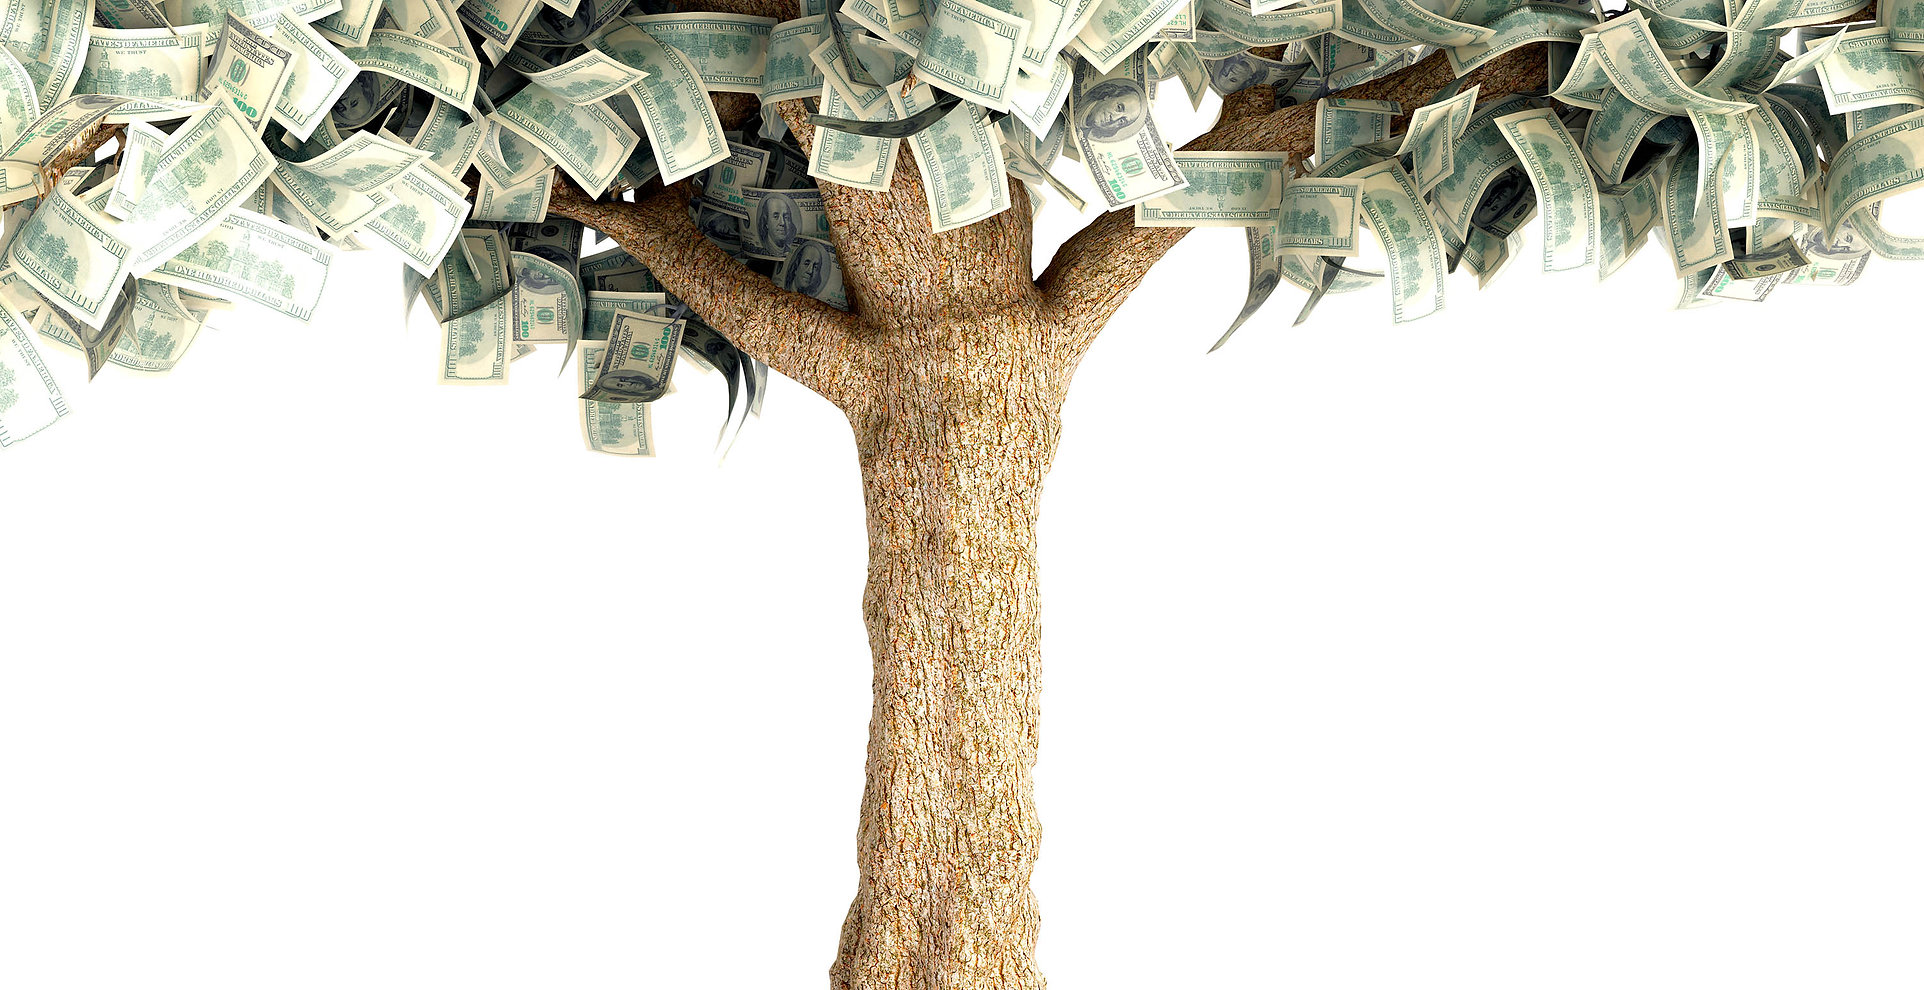 arvore_dinheiro.jpg